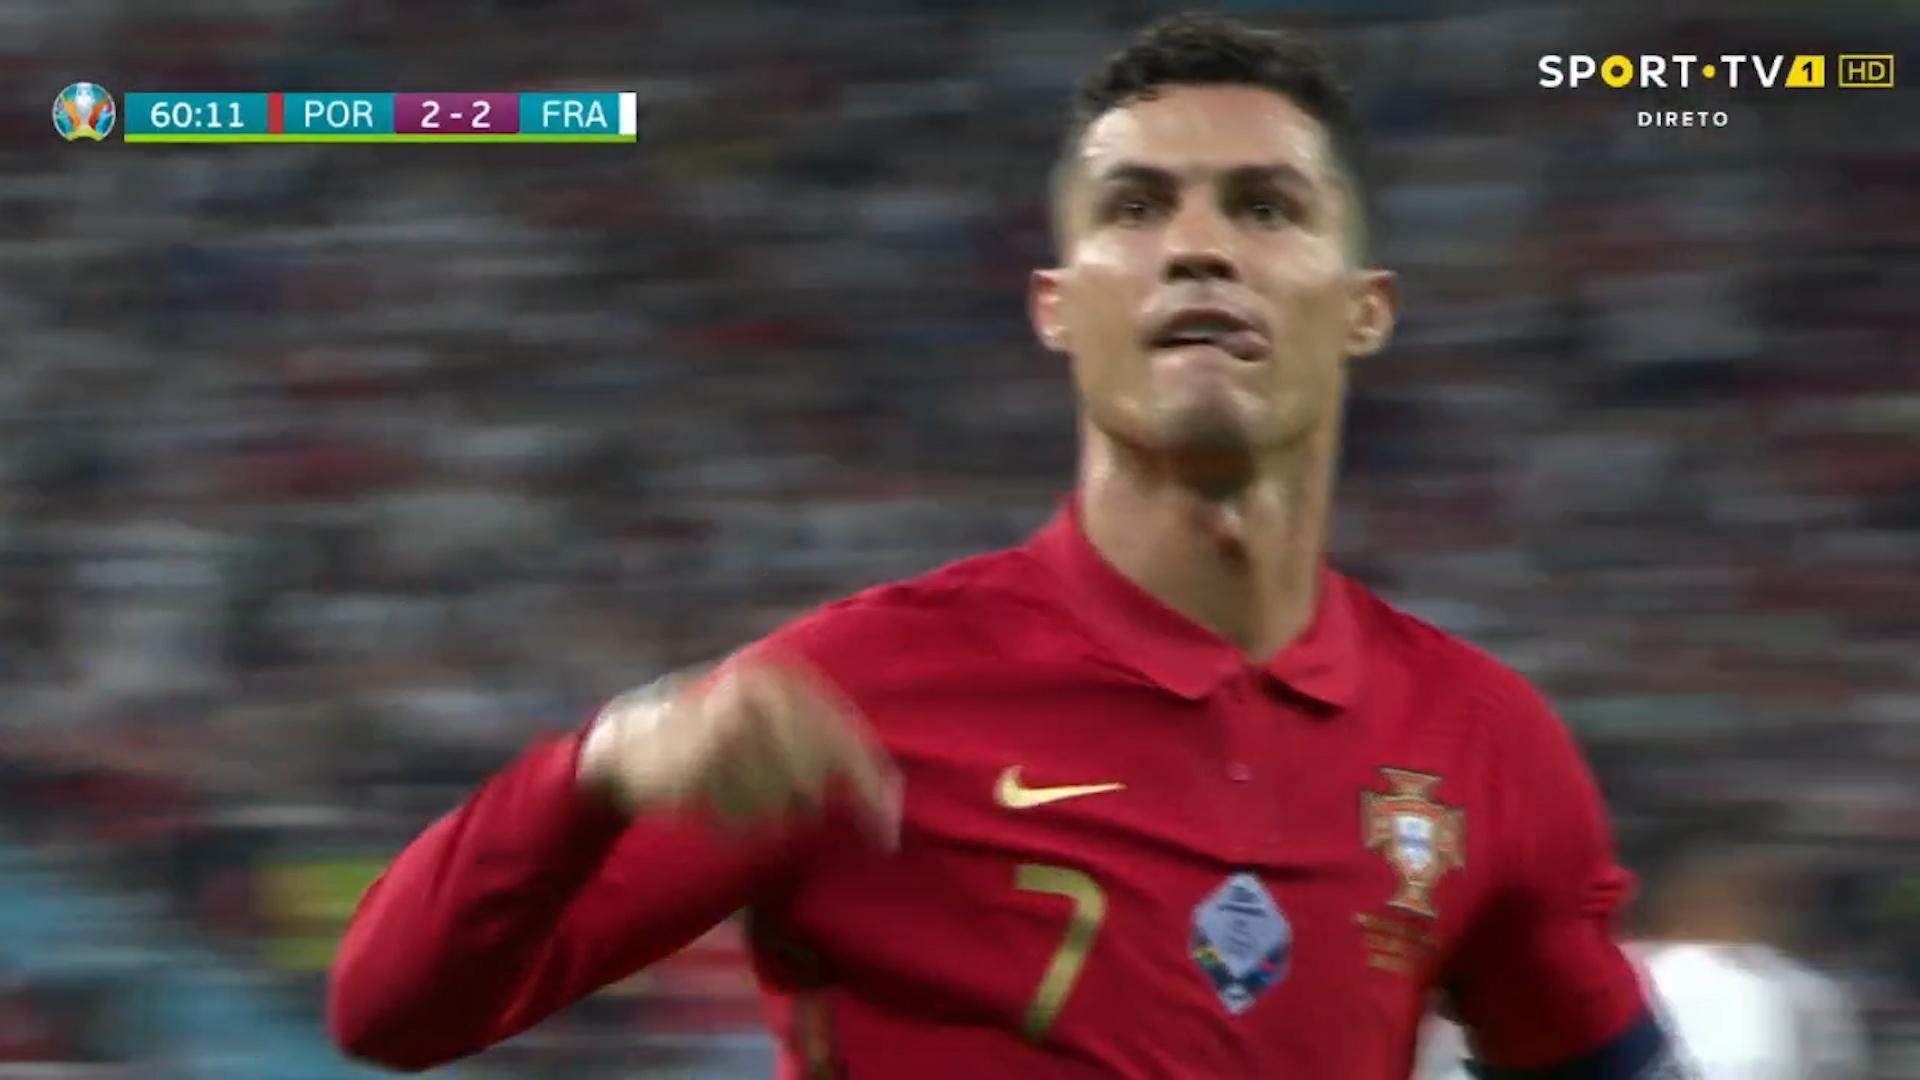 GOLO! Portugal, Cristiano Ronaldo aos 60', Portuga...